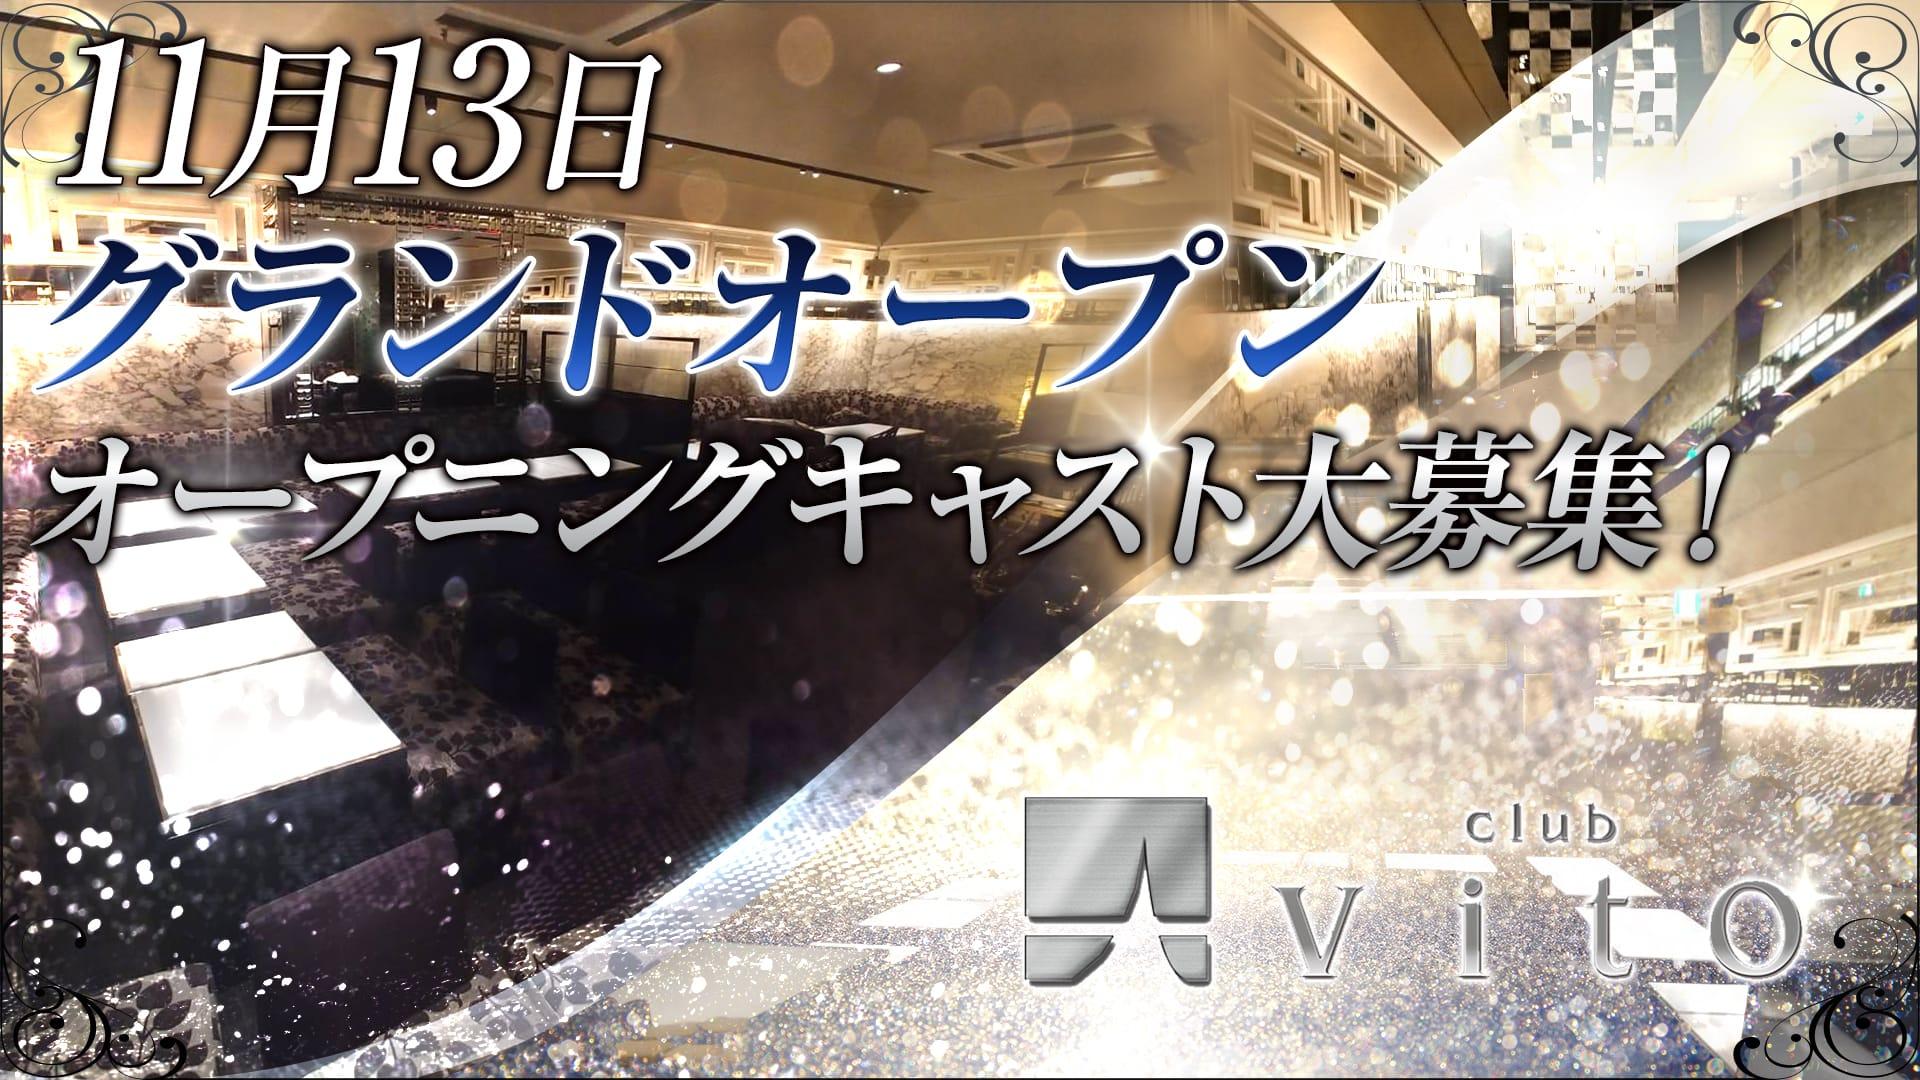 club vito(ビト) 銀座キャバクラ TOP画像